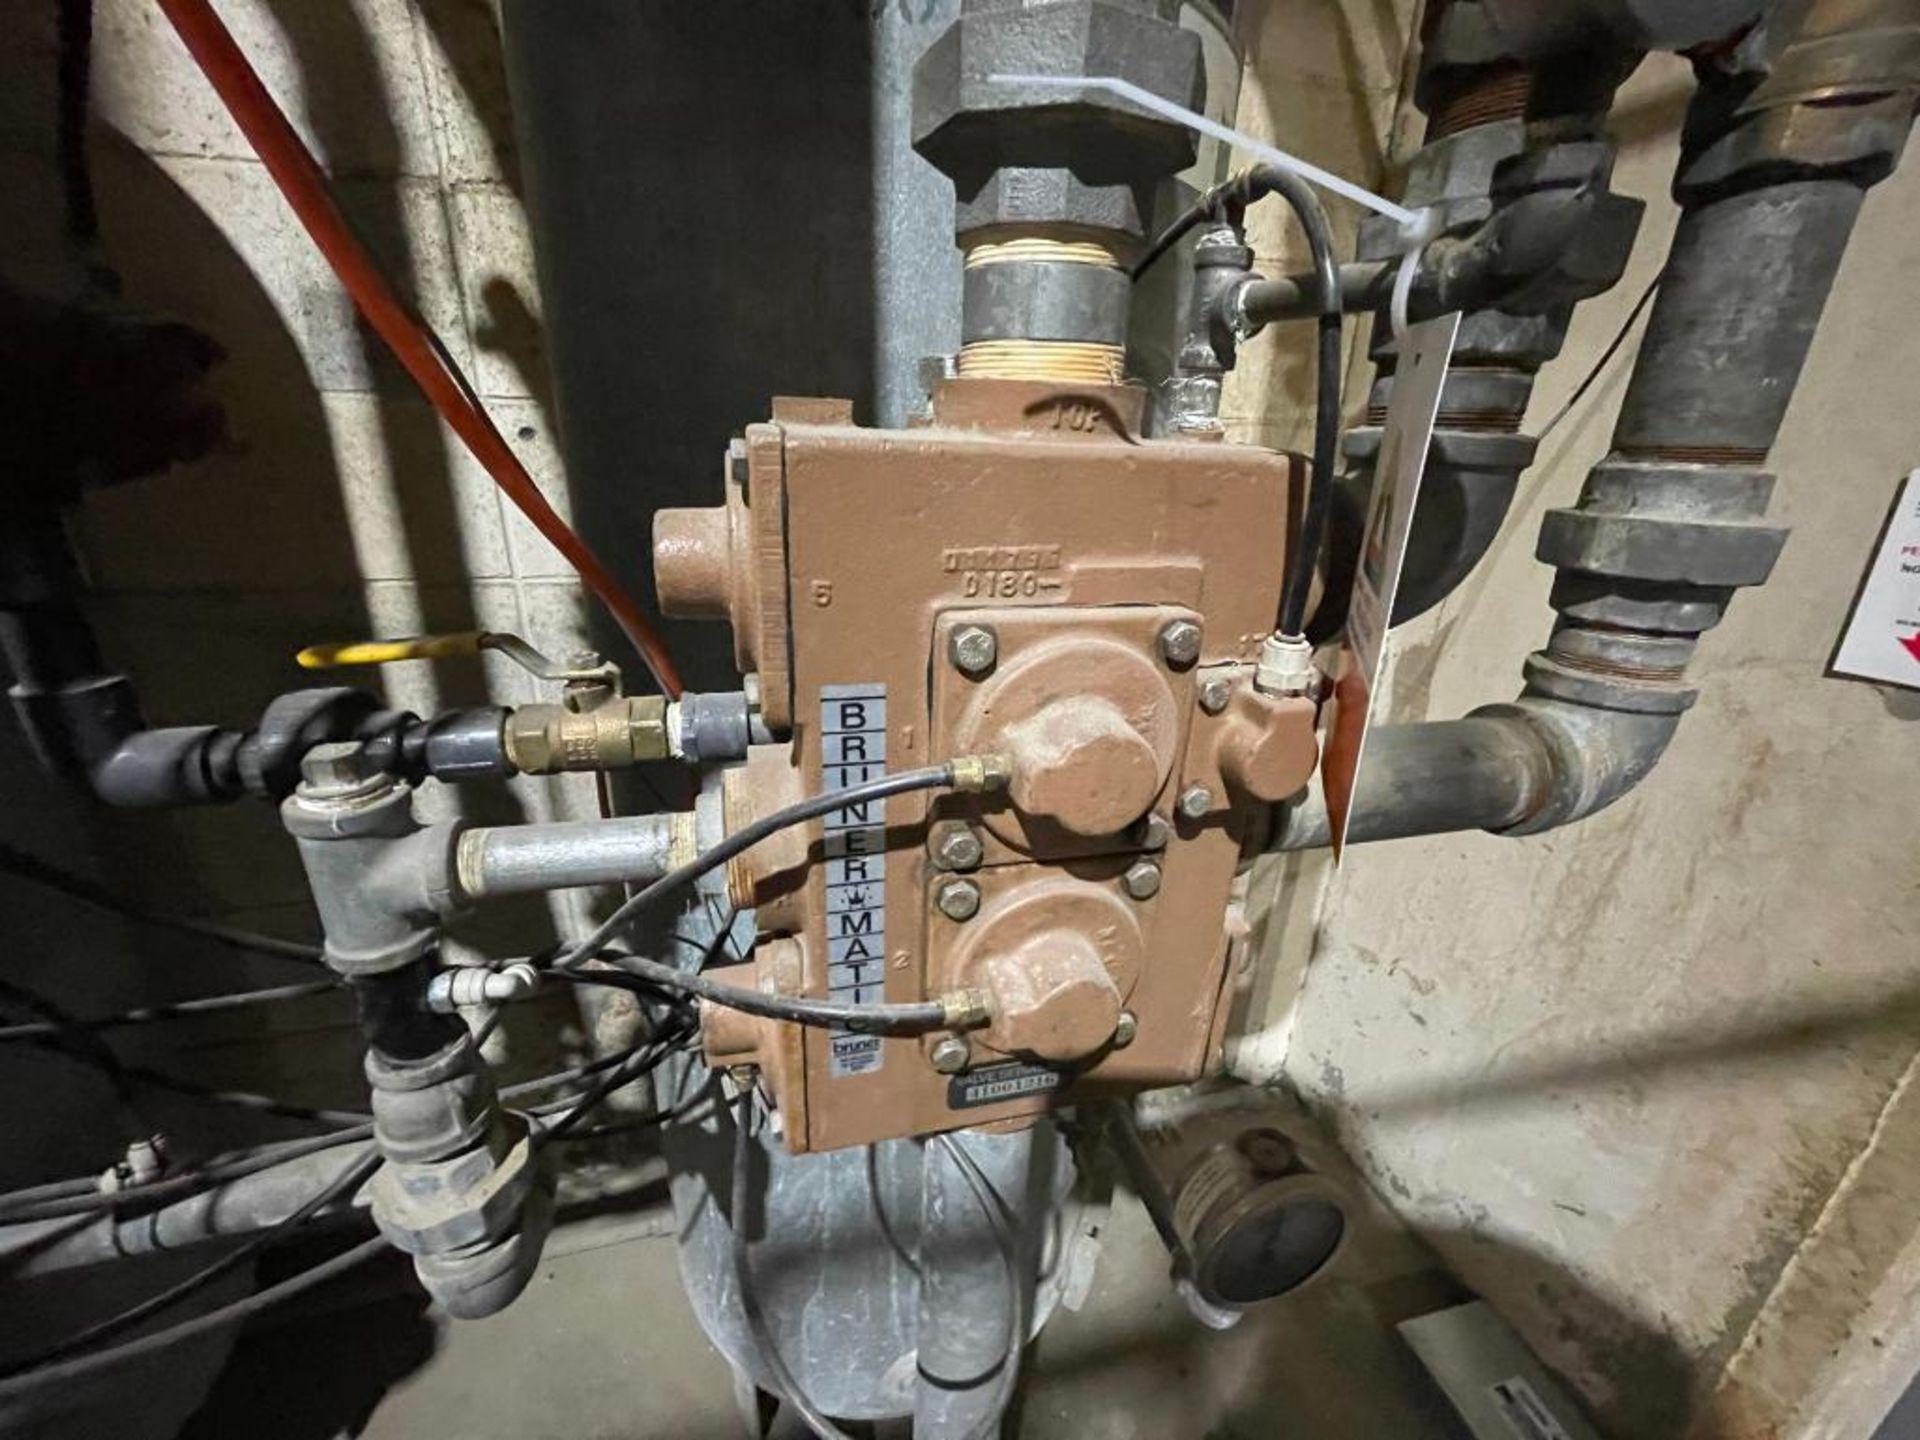 3-tank industrial water softener - Image 6 of 11